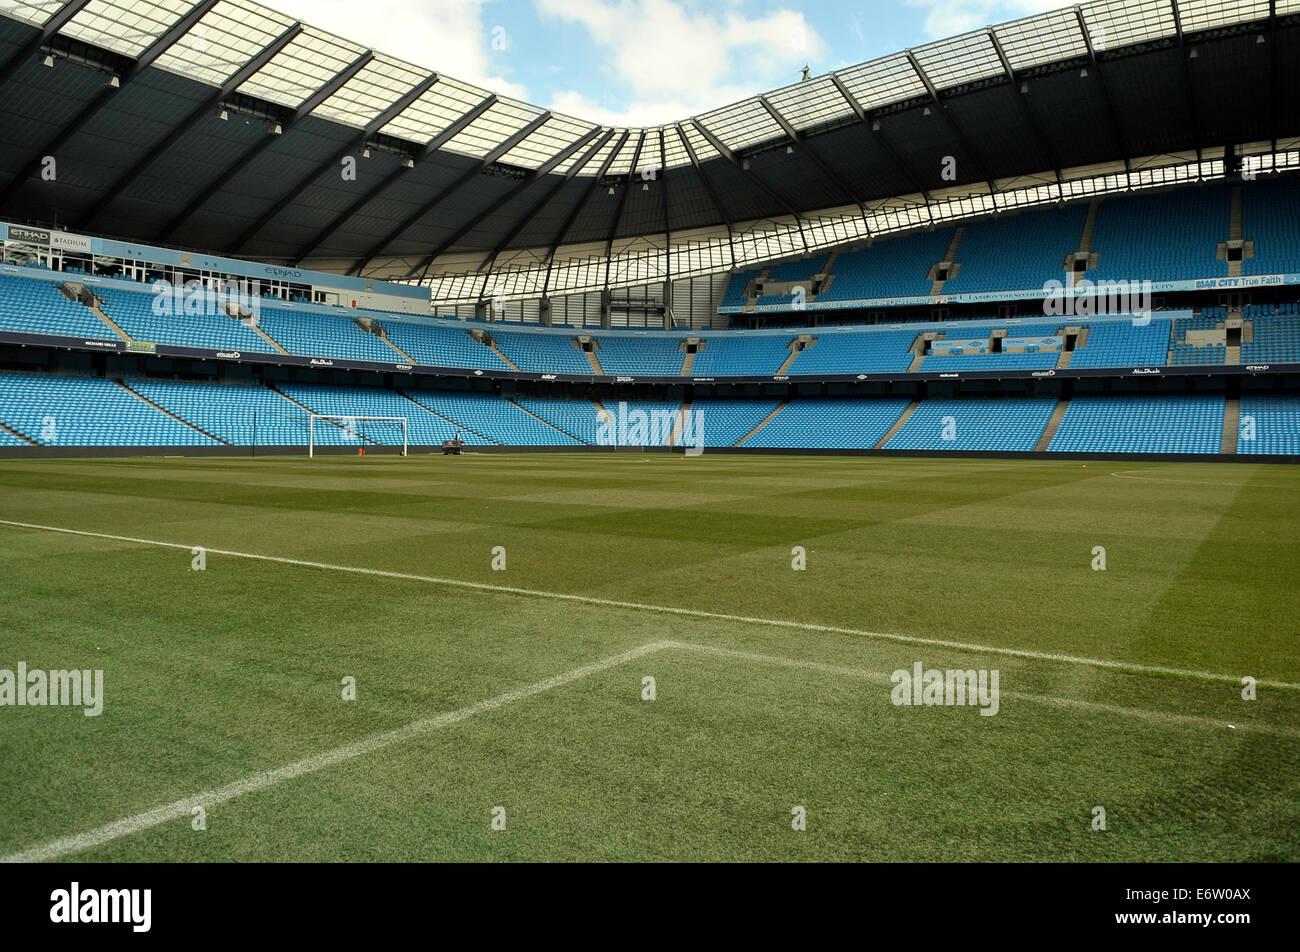 etihad stadium - Stock Image